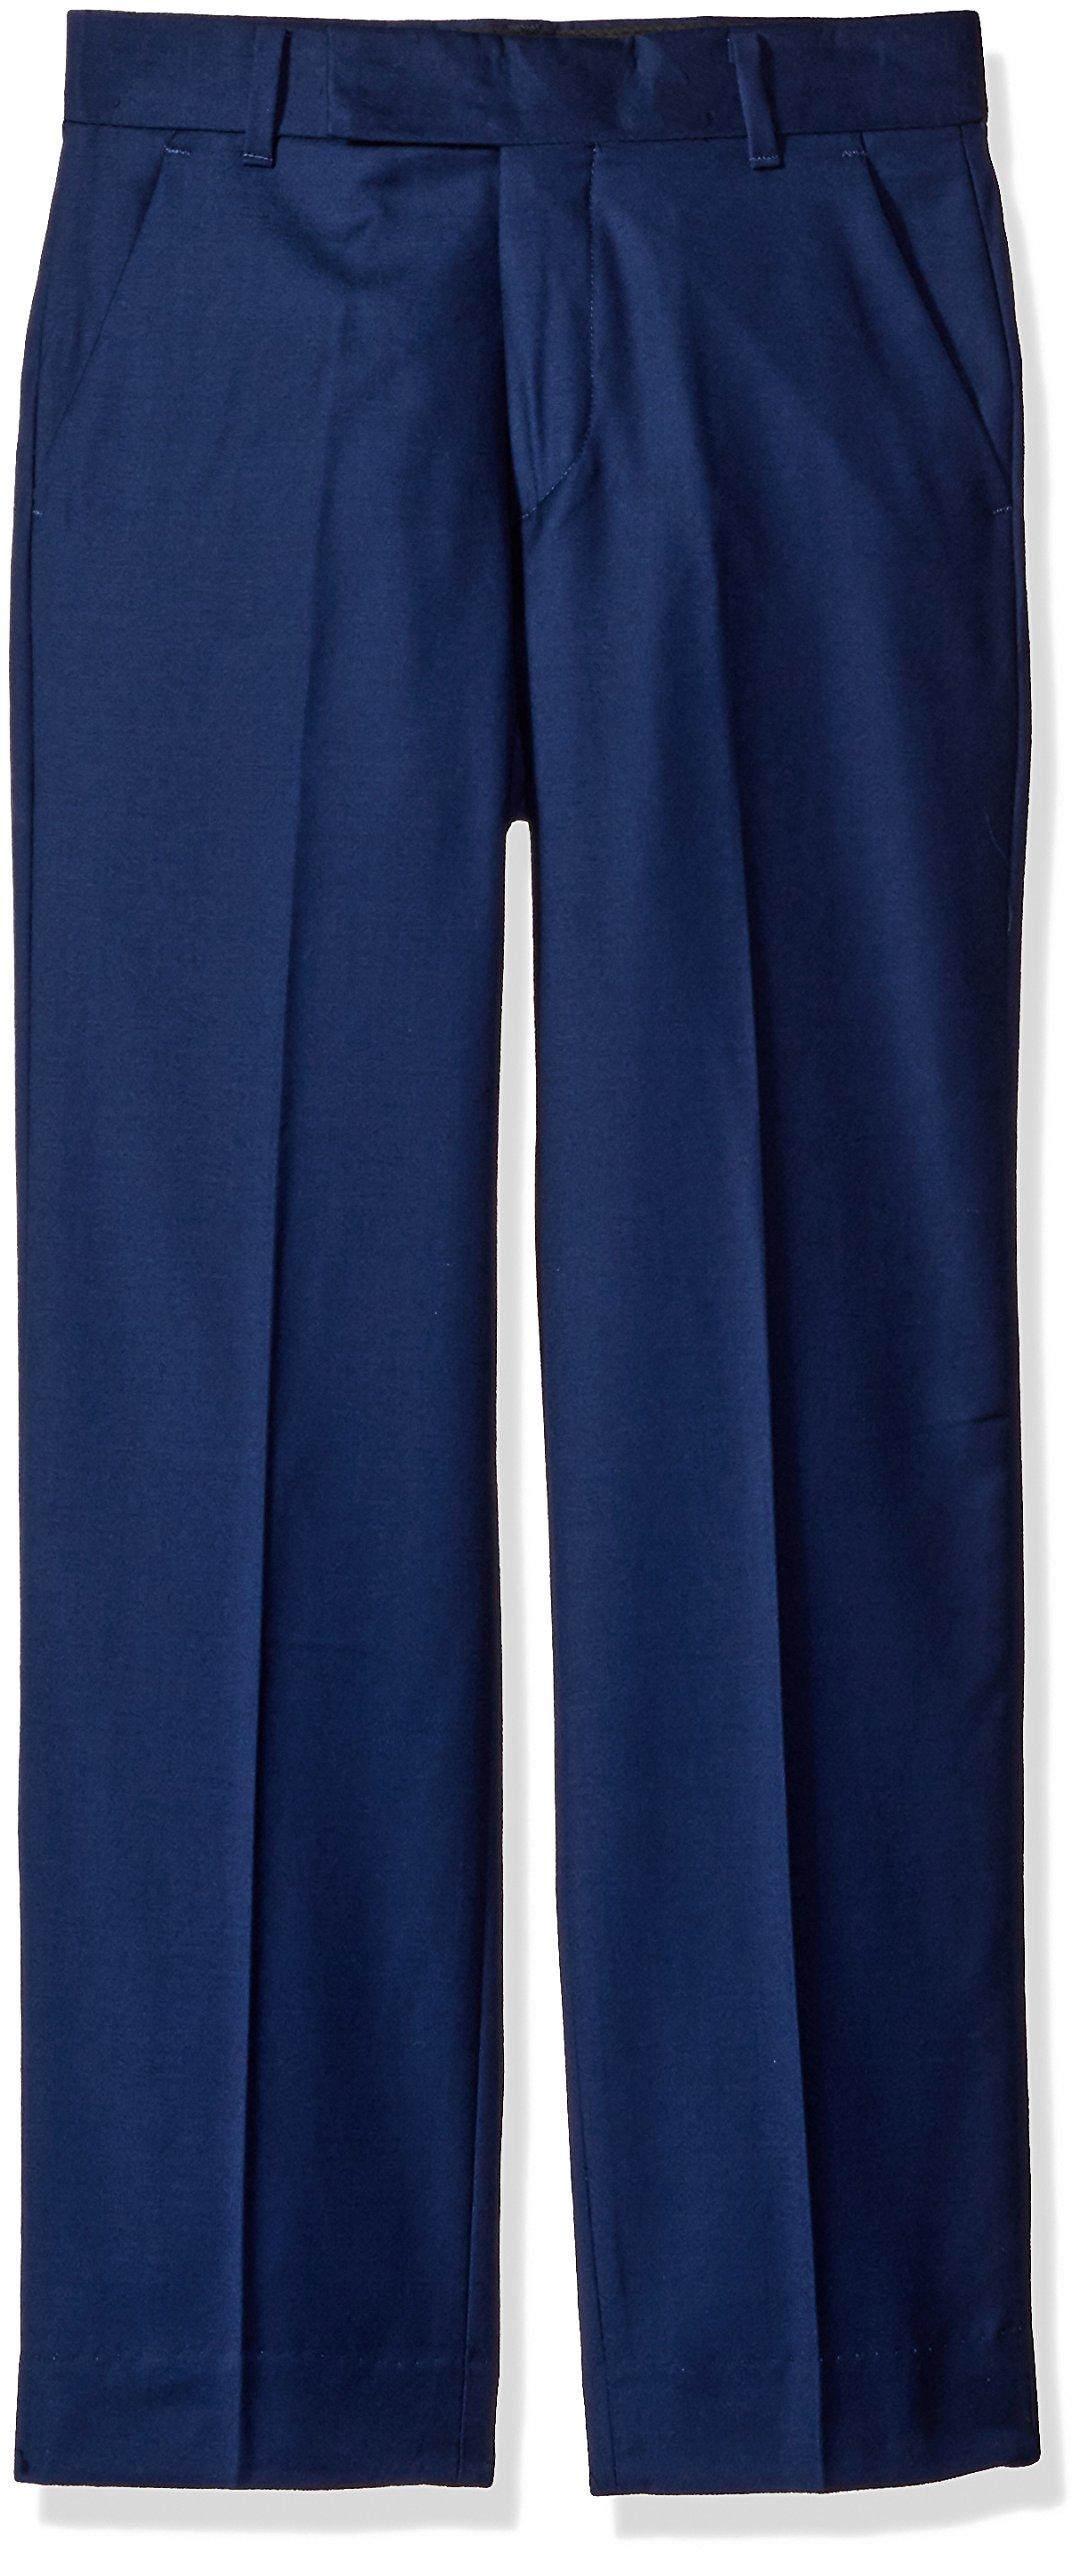 Calvin Klein Big Boys' Flat Front Dress Pant, Infinite Blue, 10 by Calvin Klein (Image #2)